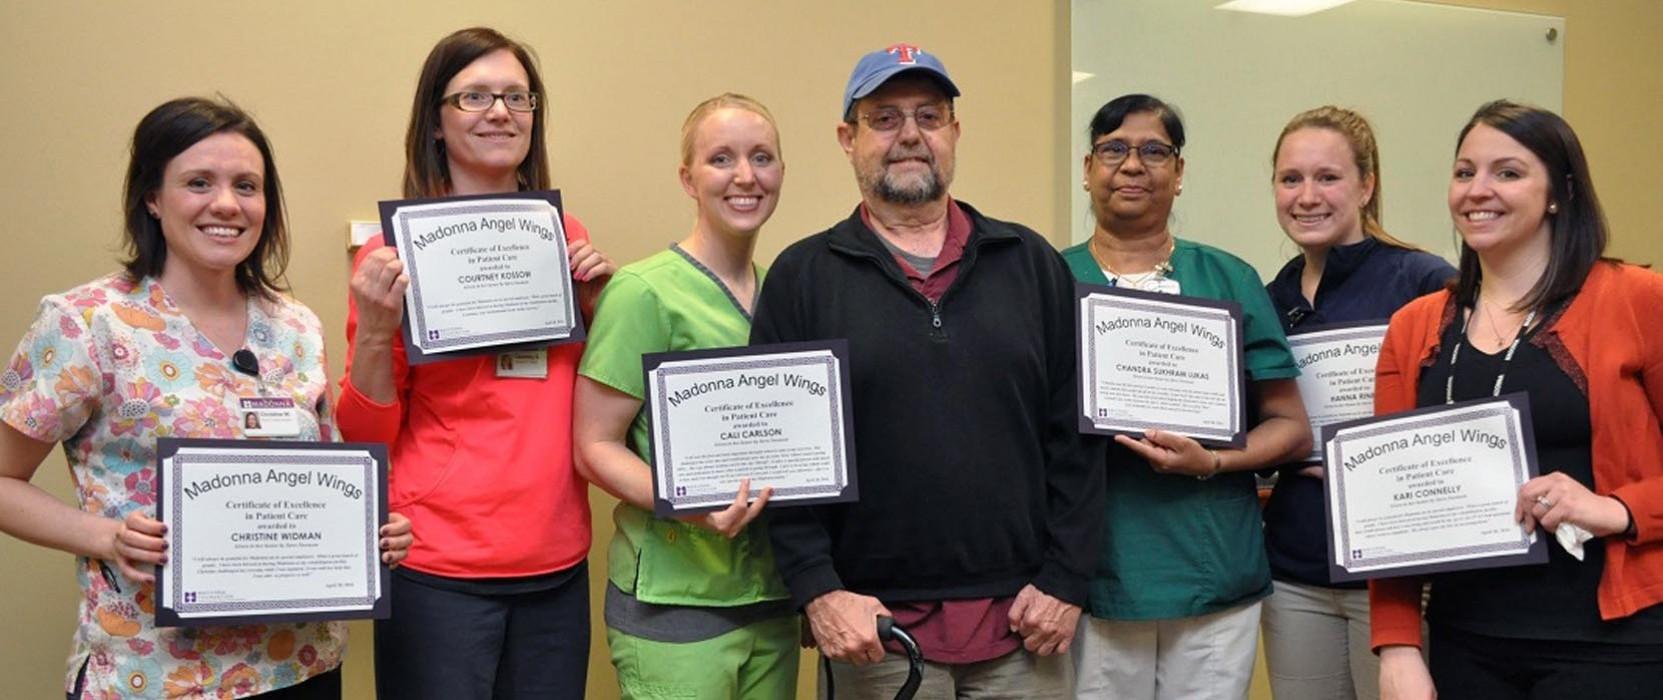 Past patient shares gratitude through Angel Wings program